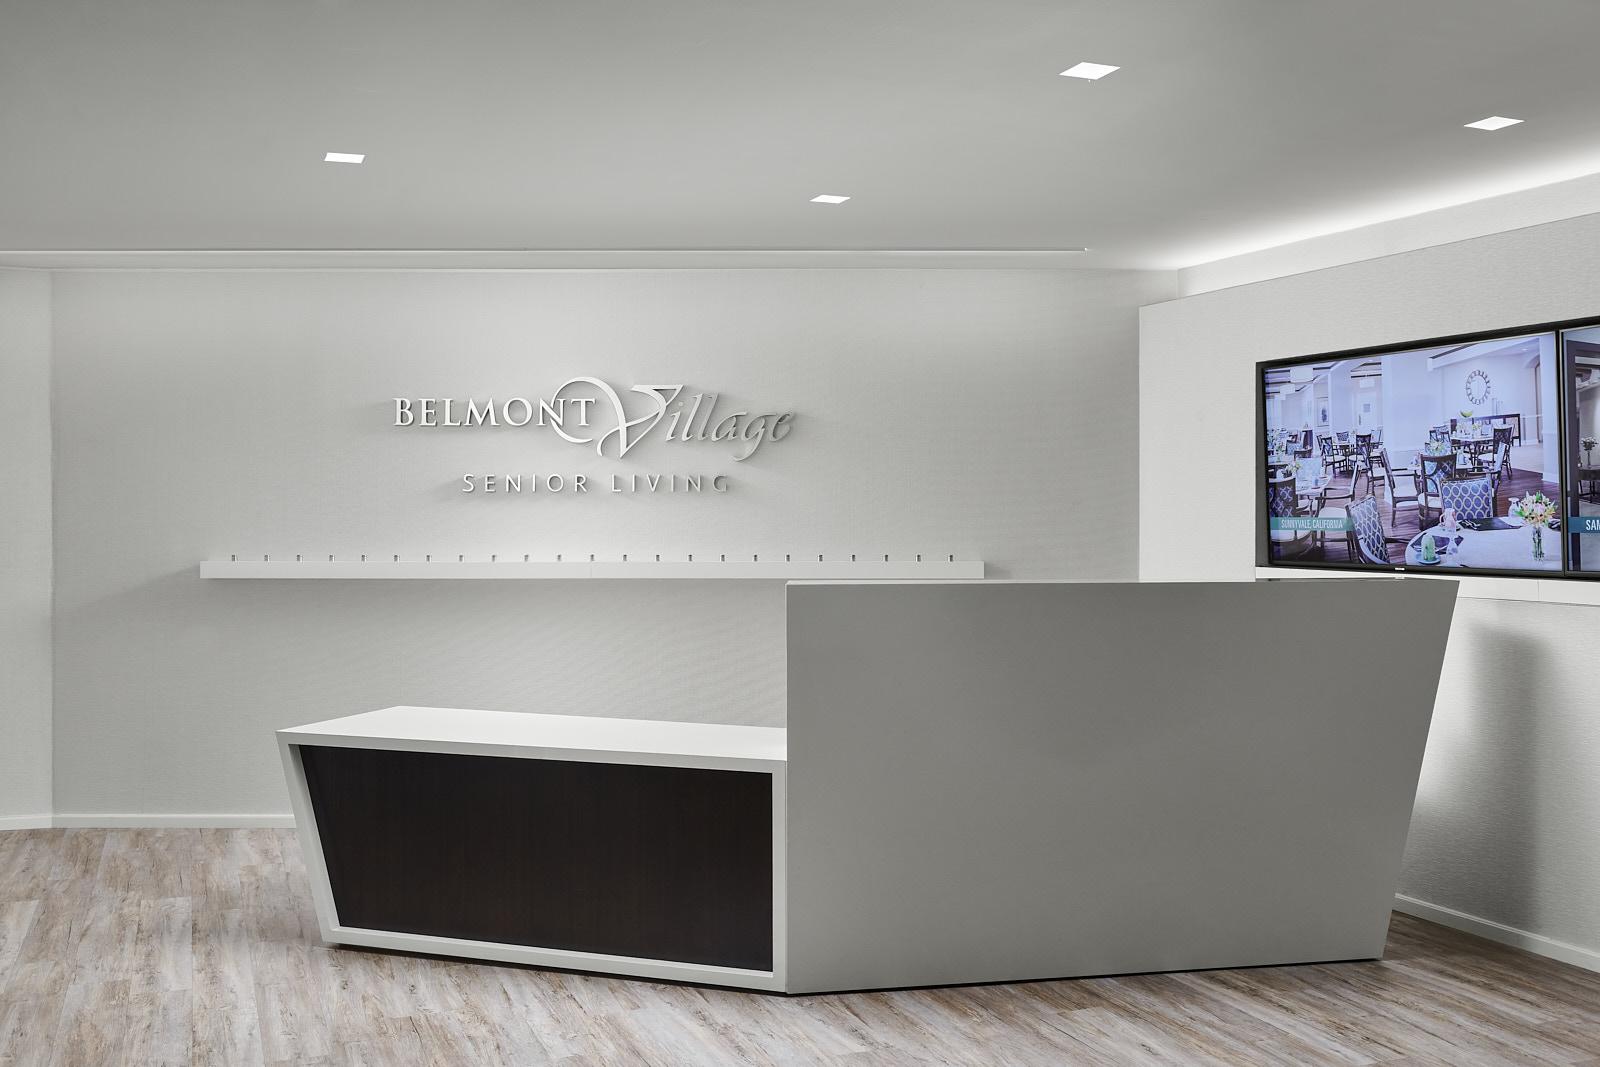 Institutional Corporate Office Interior Design Belmont Village Reception Desk